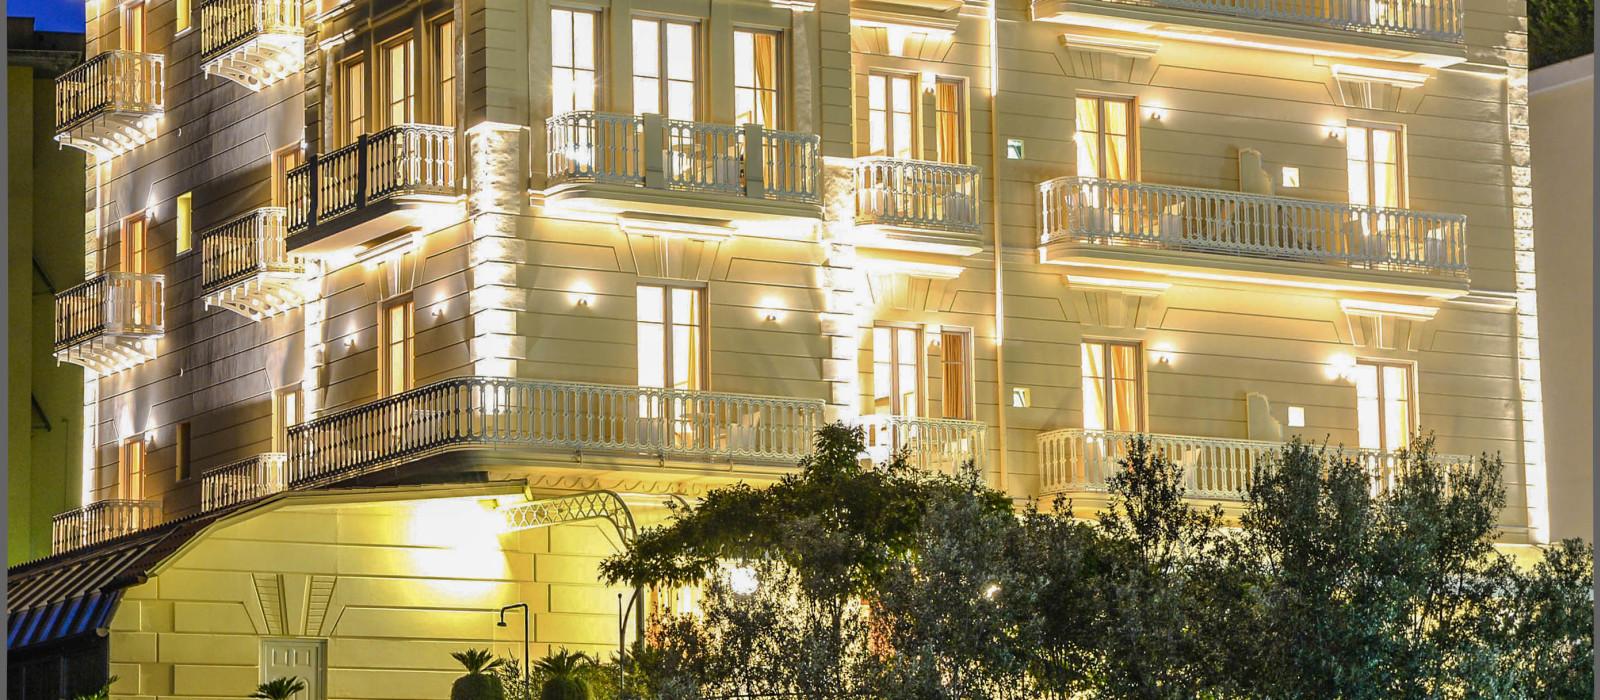 Hotel  Antiche Mura Italien